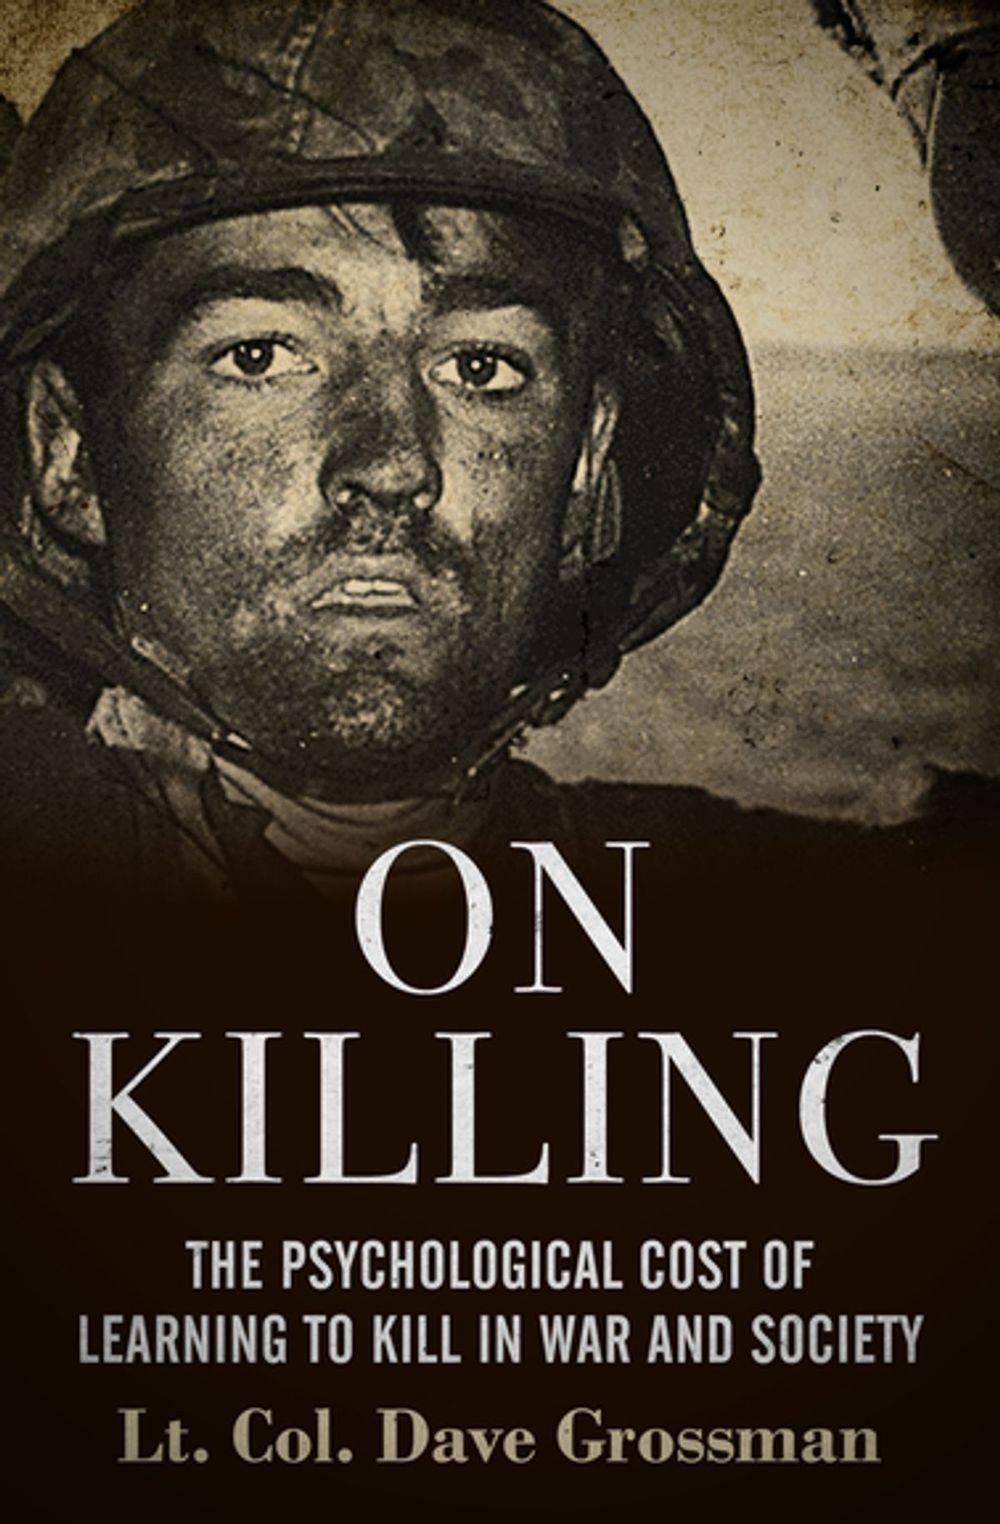 on killing, dave grossman, killing, war, society, war is my business